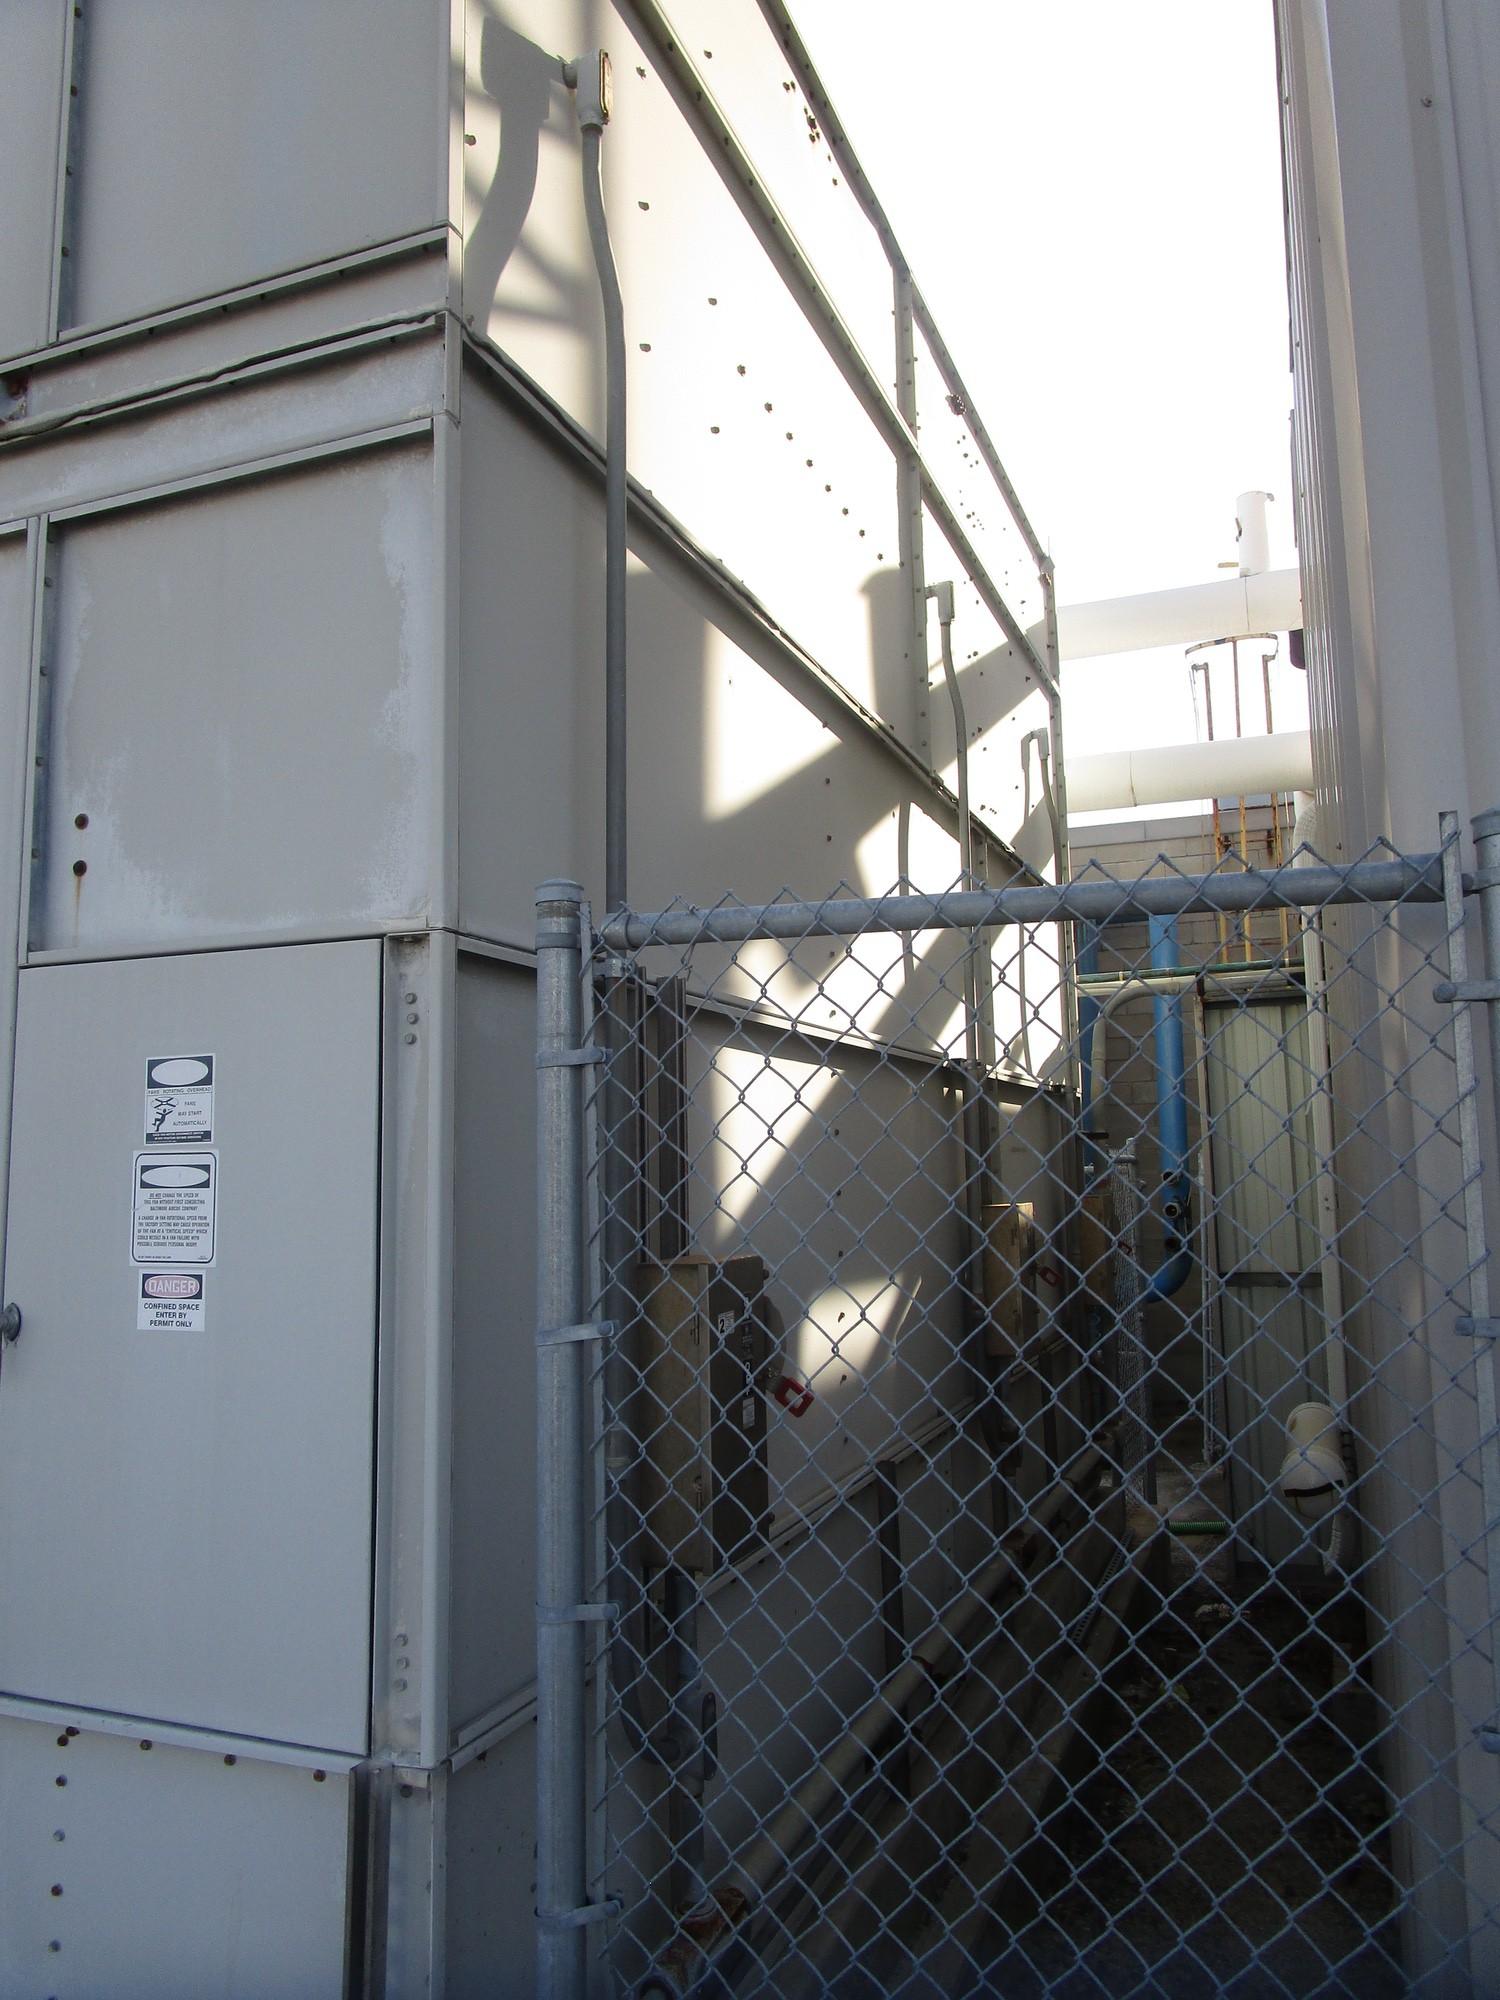 Baltimore FXV-662 Water Tower s/n U040080301, Belt # 3R-B100, (2) US Motors 7.5 HP | Contact Rigger - Image 4 of 5